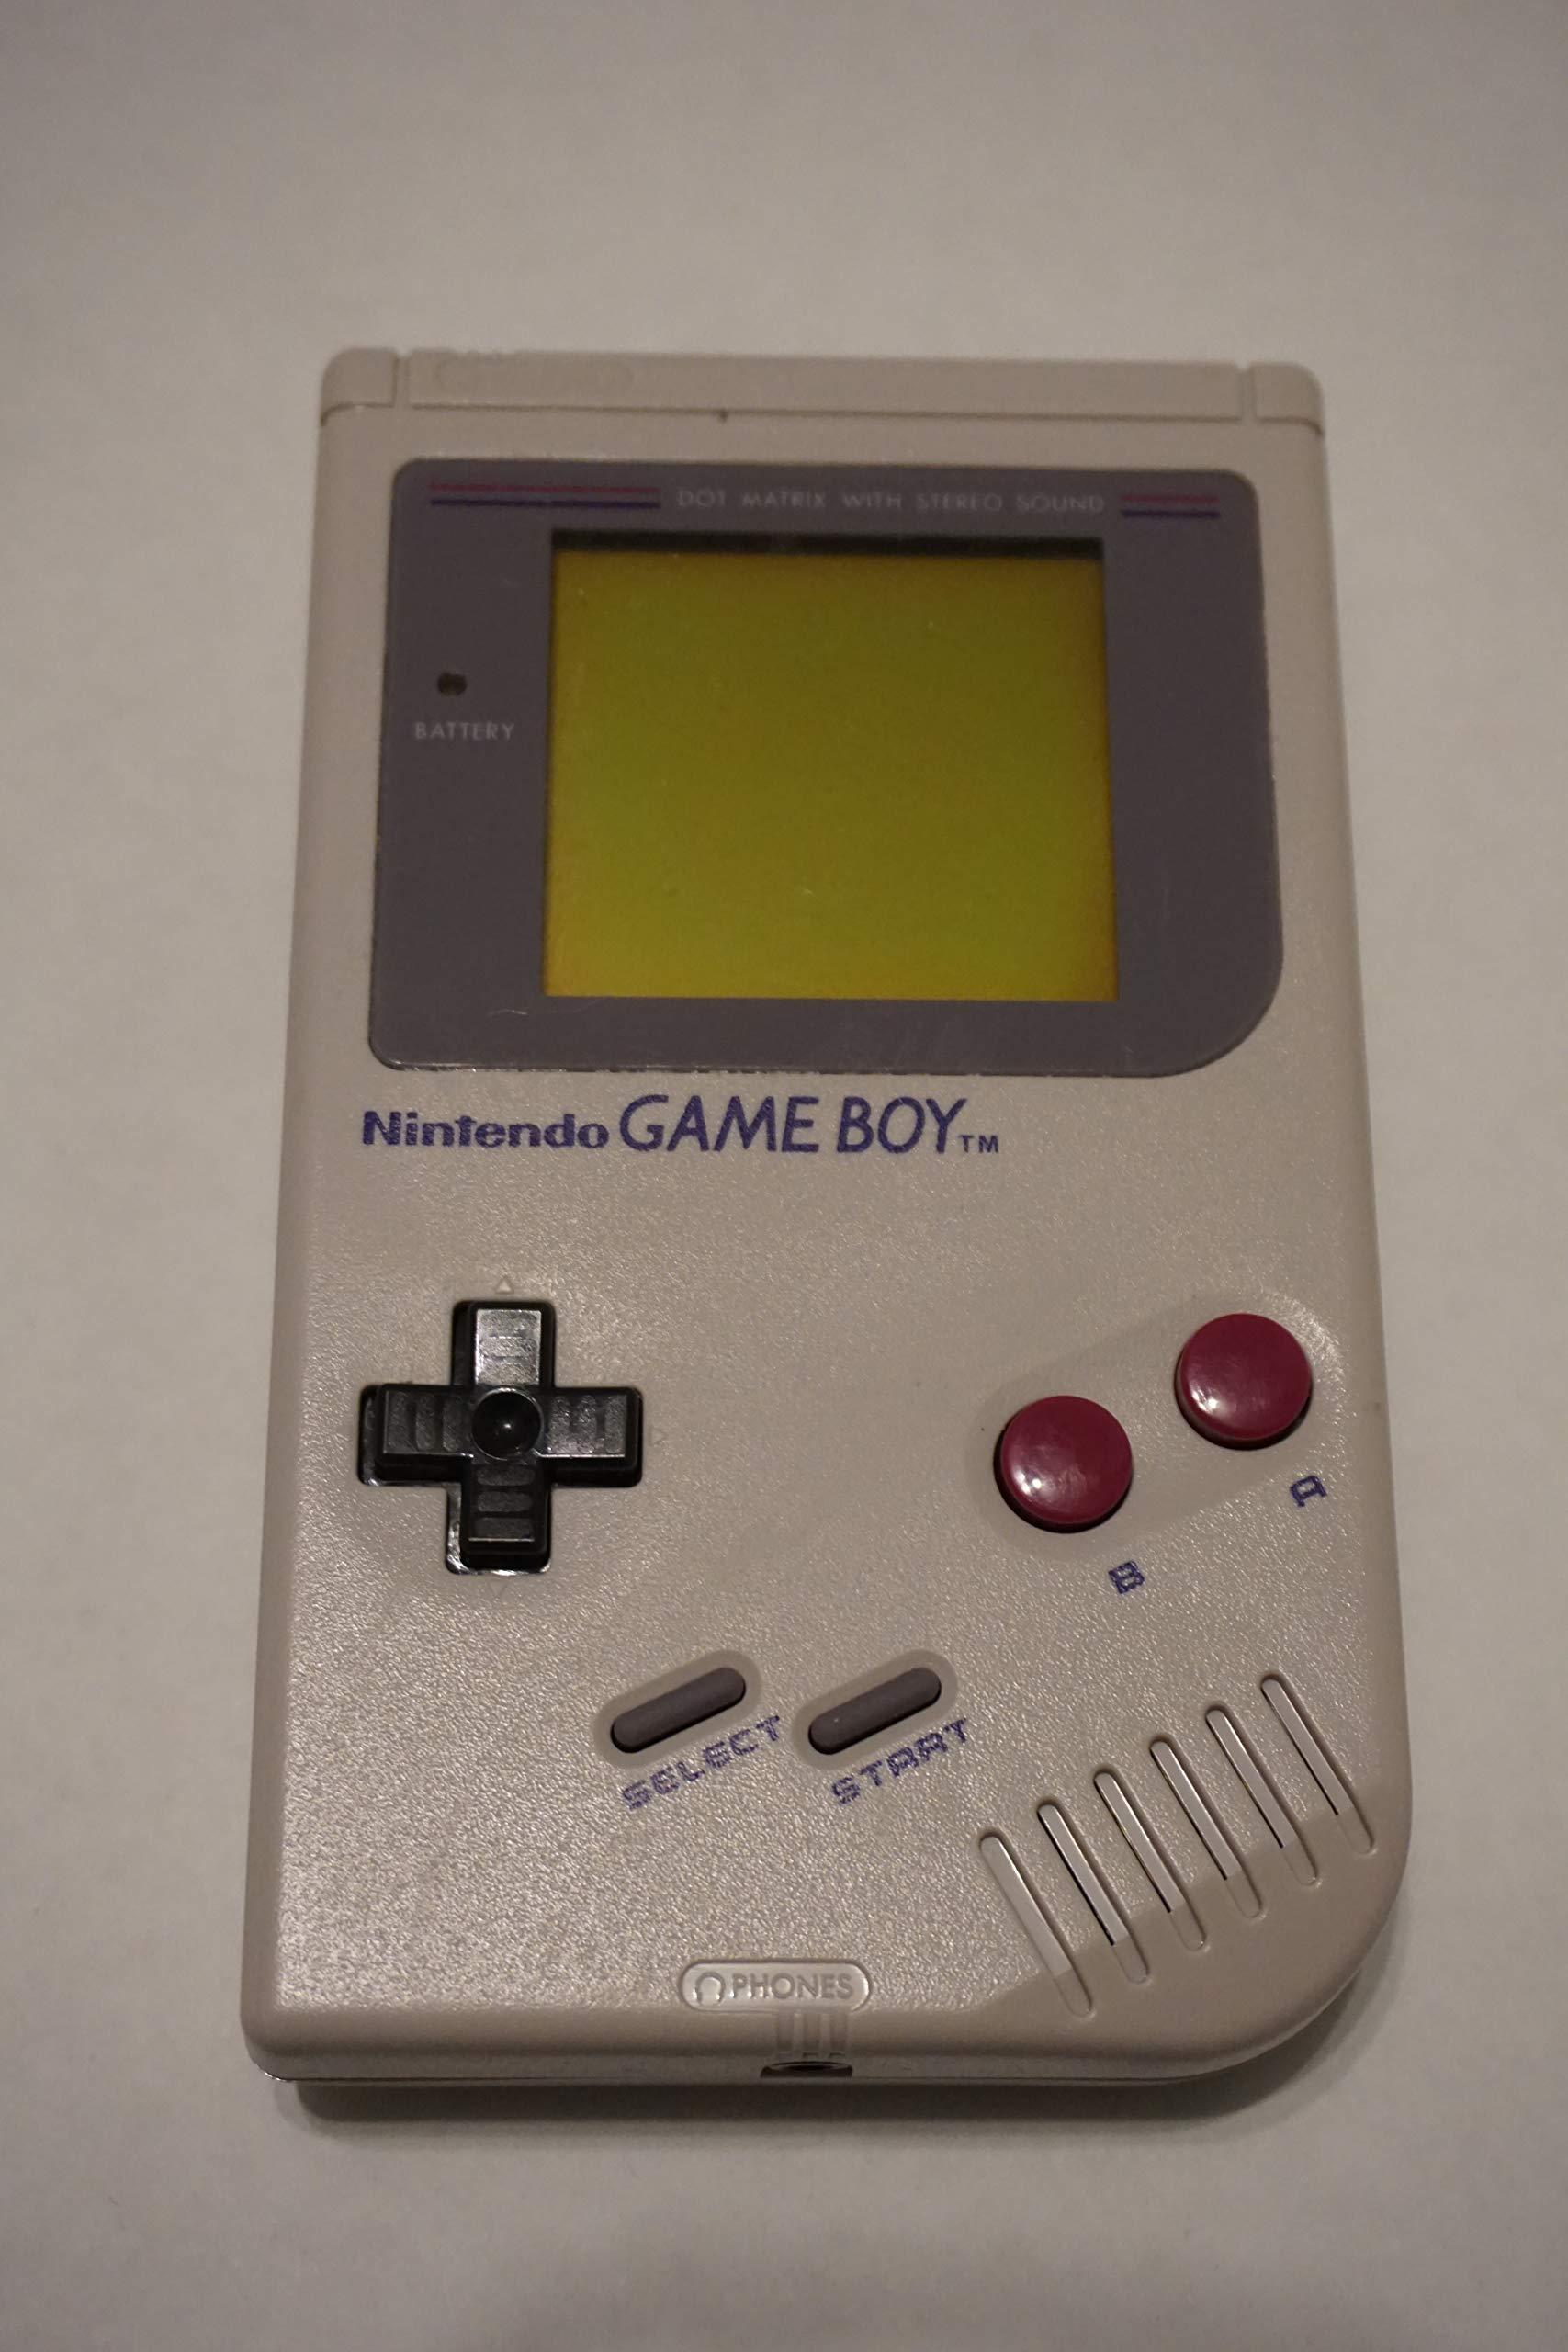 Nintendo Game Boy - Original (Gray) - Buy Online in UAE